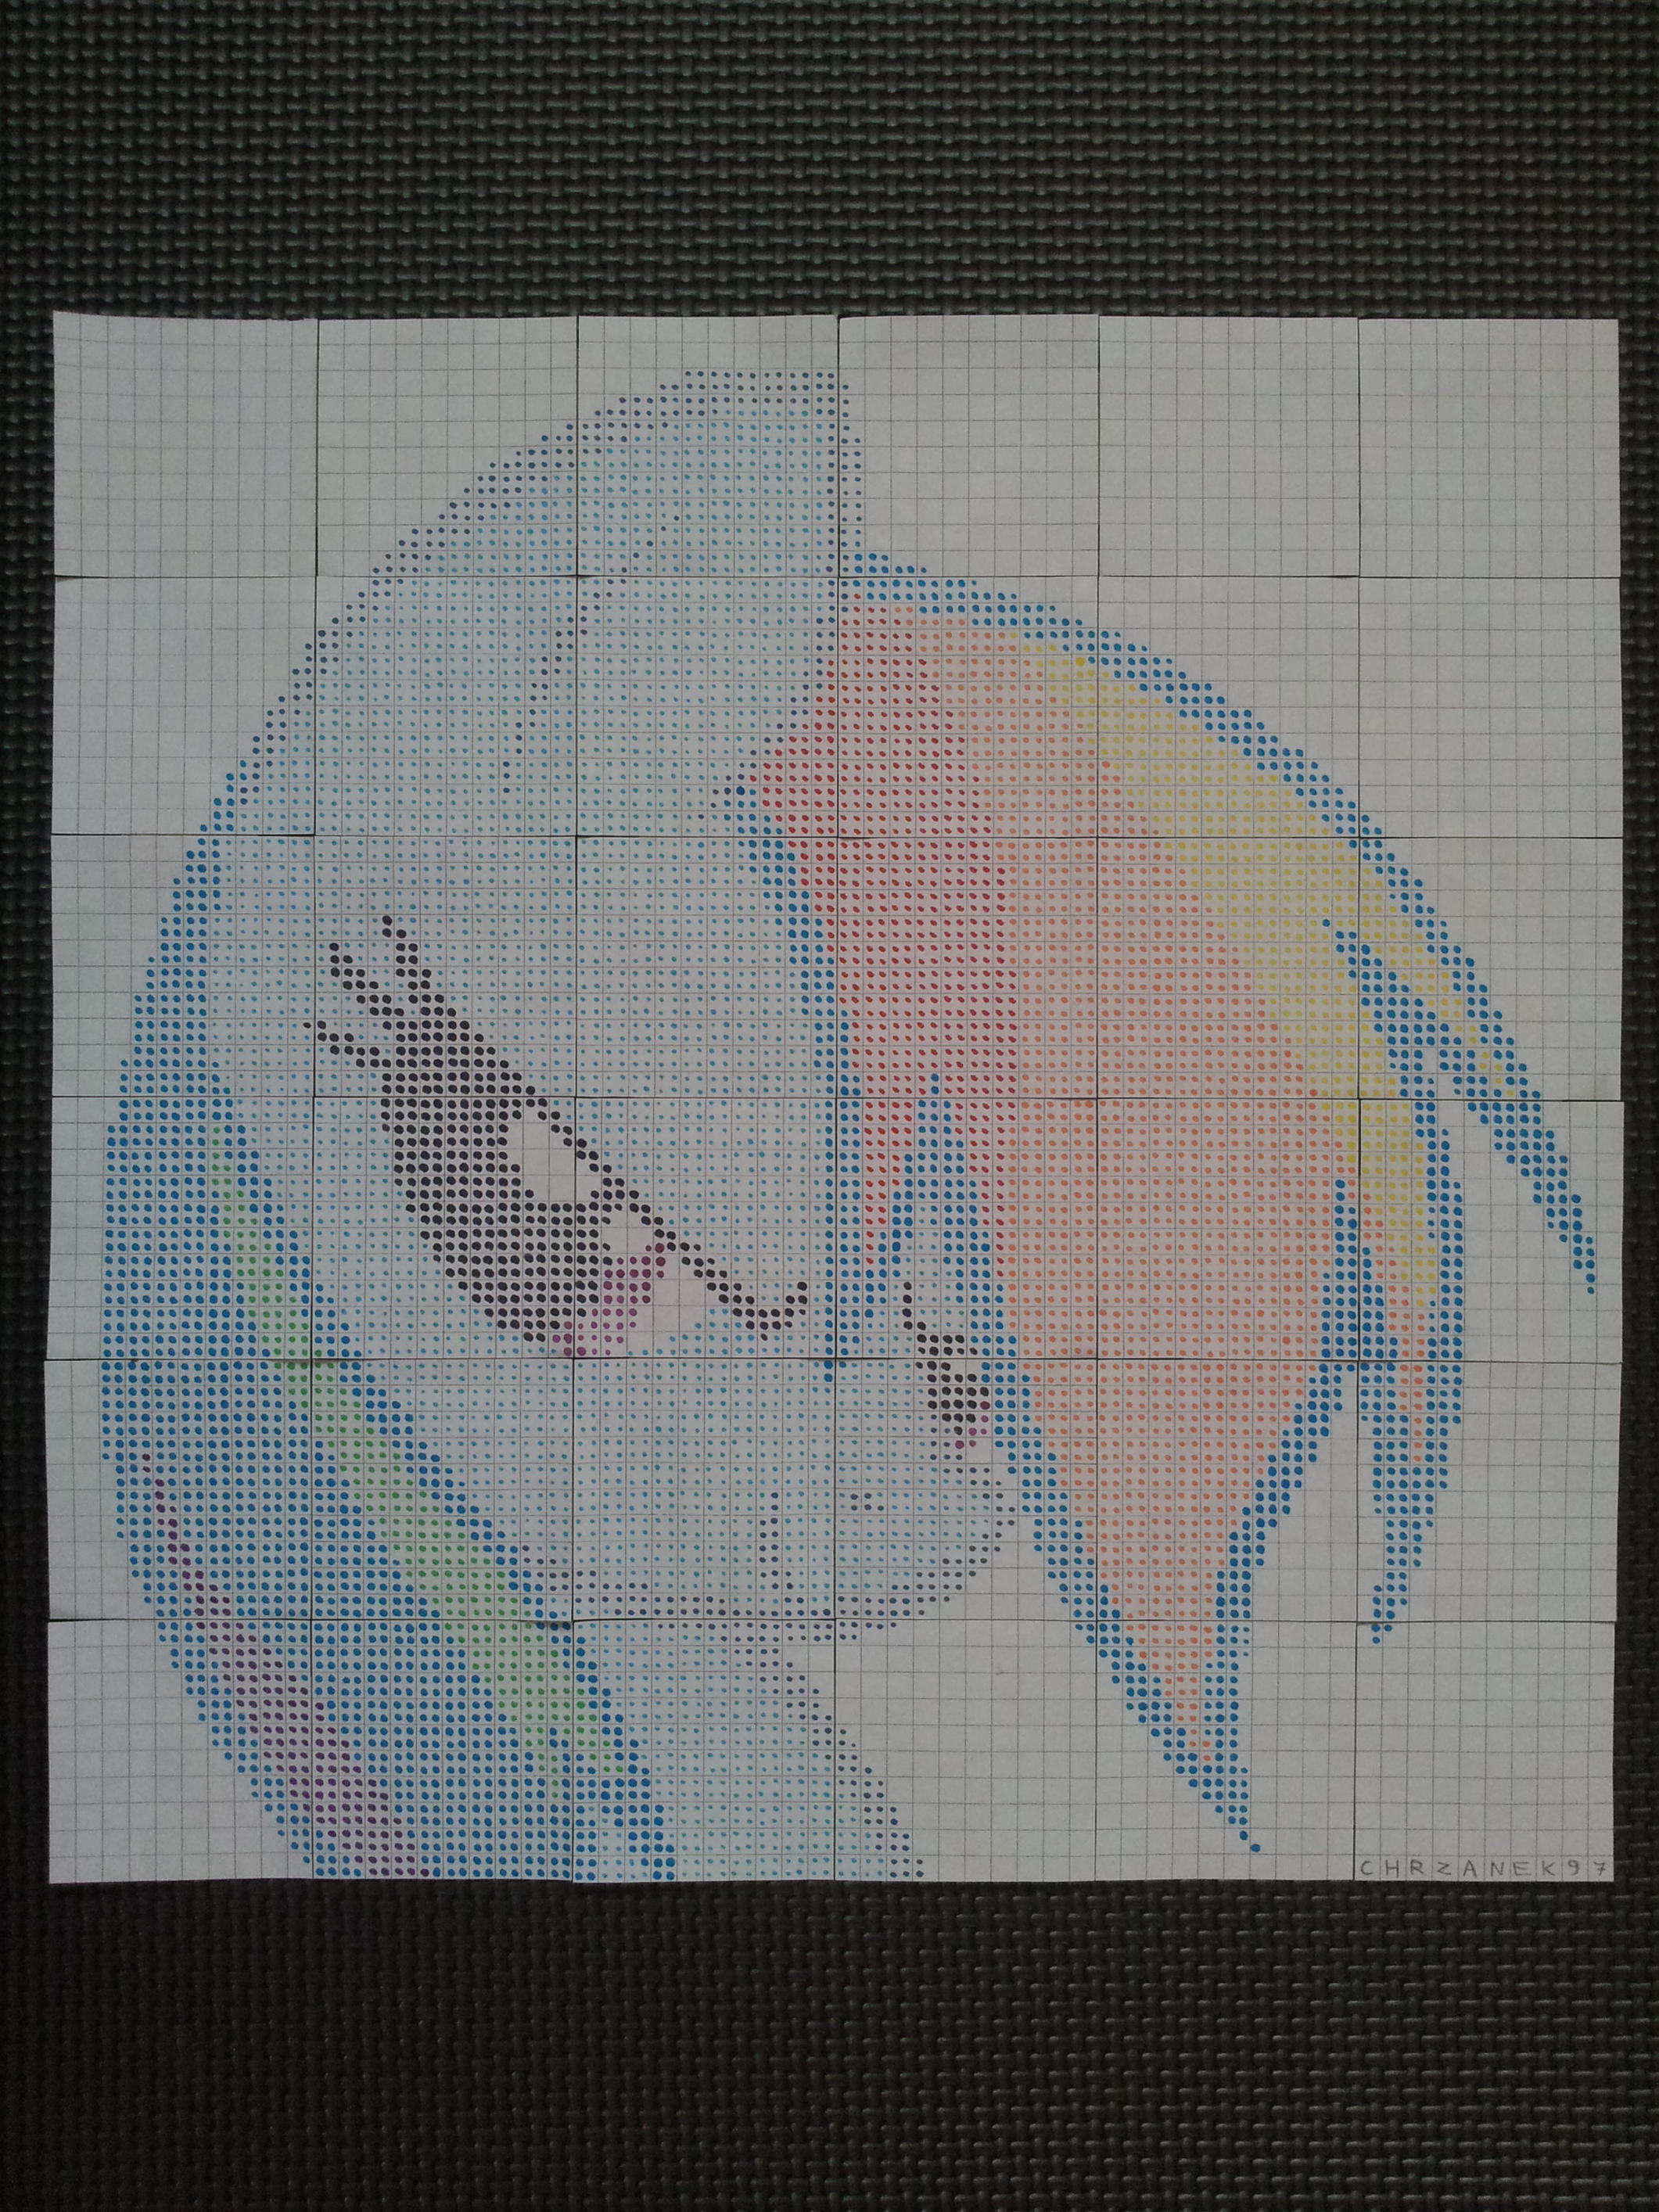 Rainbow Dash portrait (DotWork) by Chrzanek97